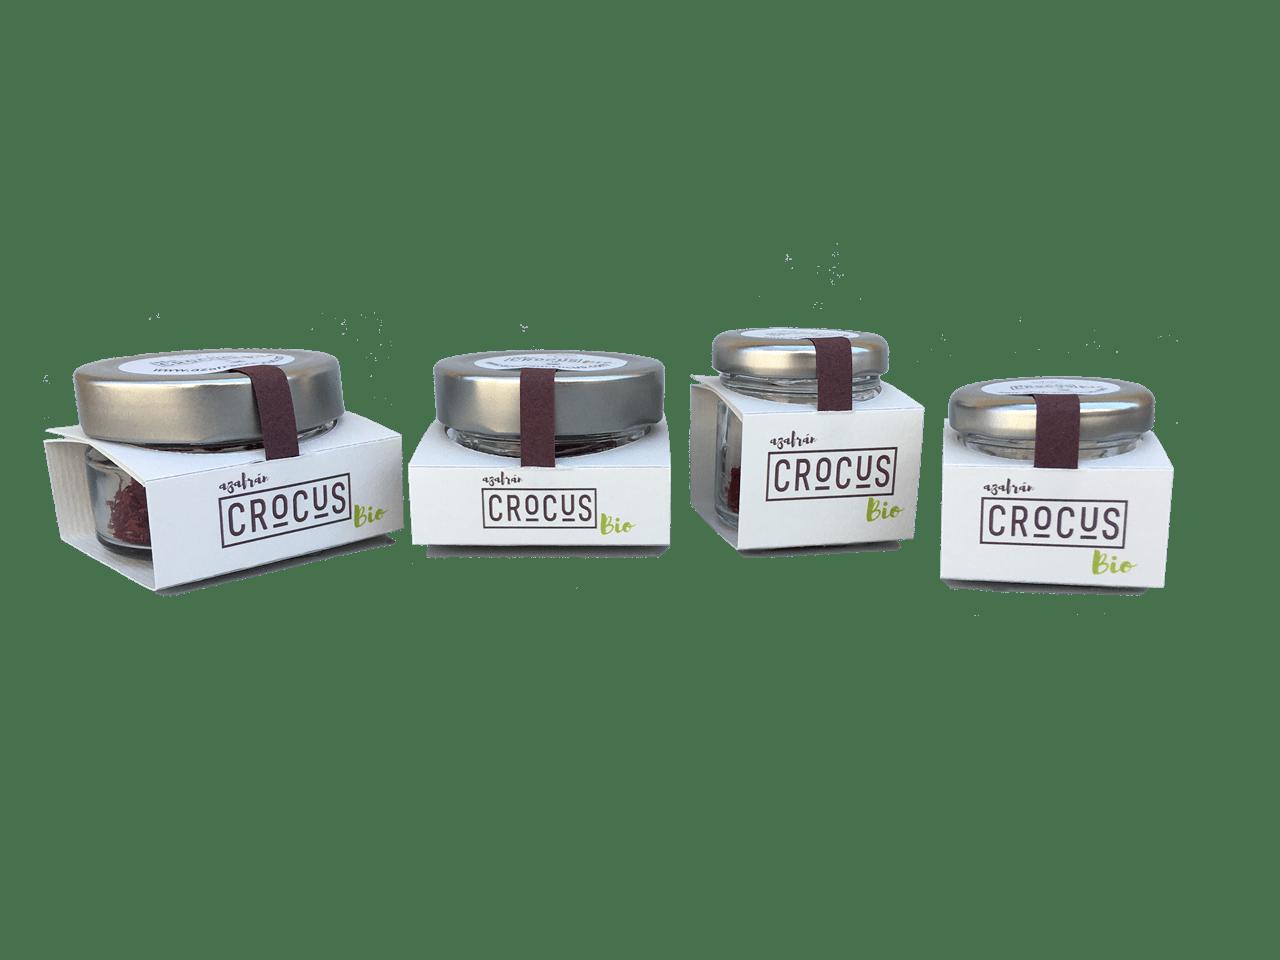 Crocus - Puro azafrán ecológico